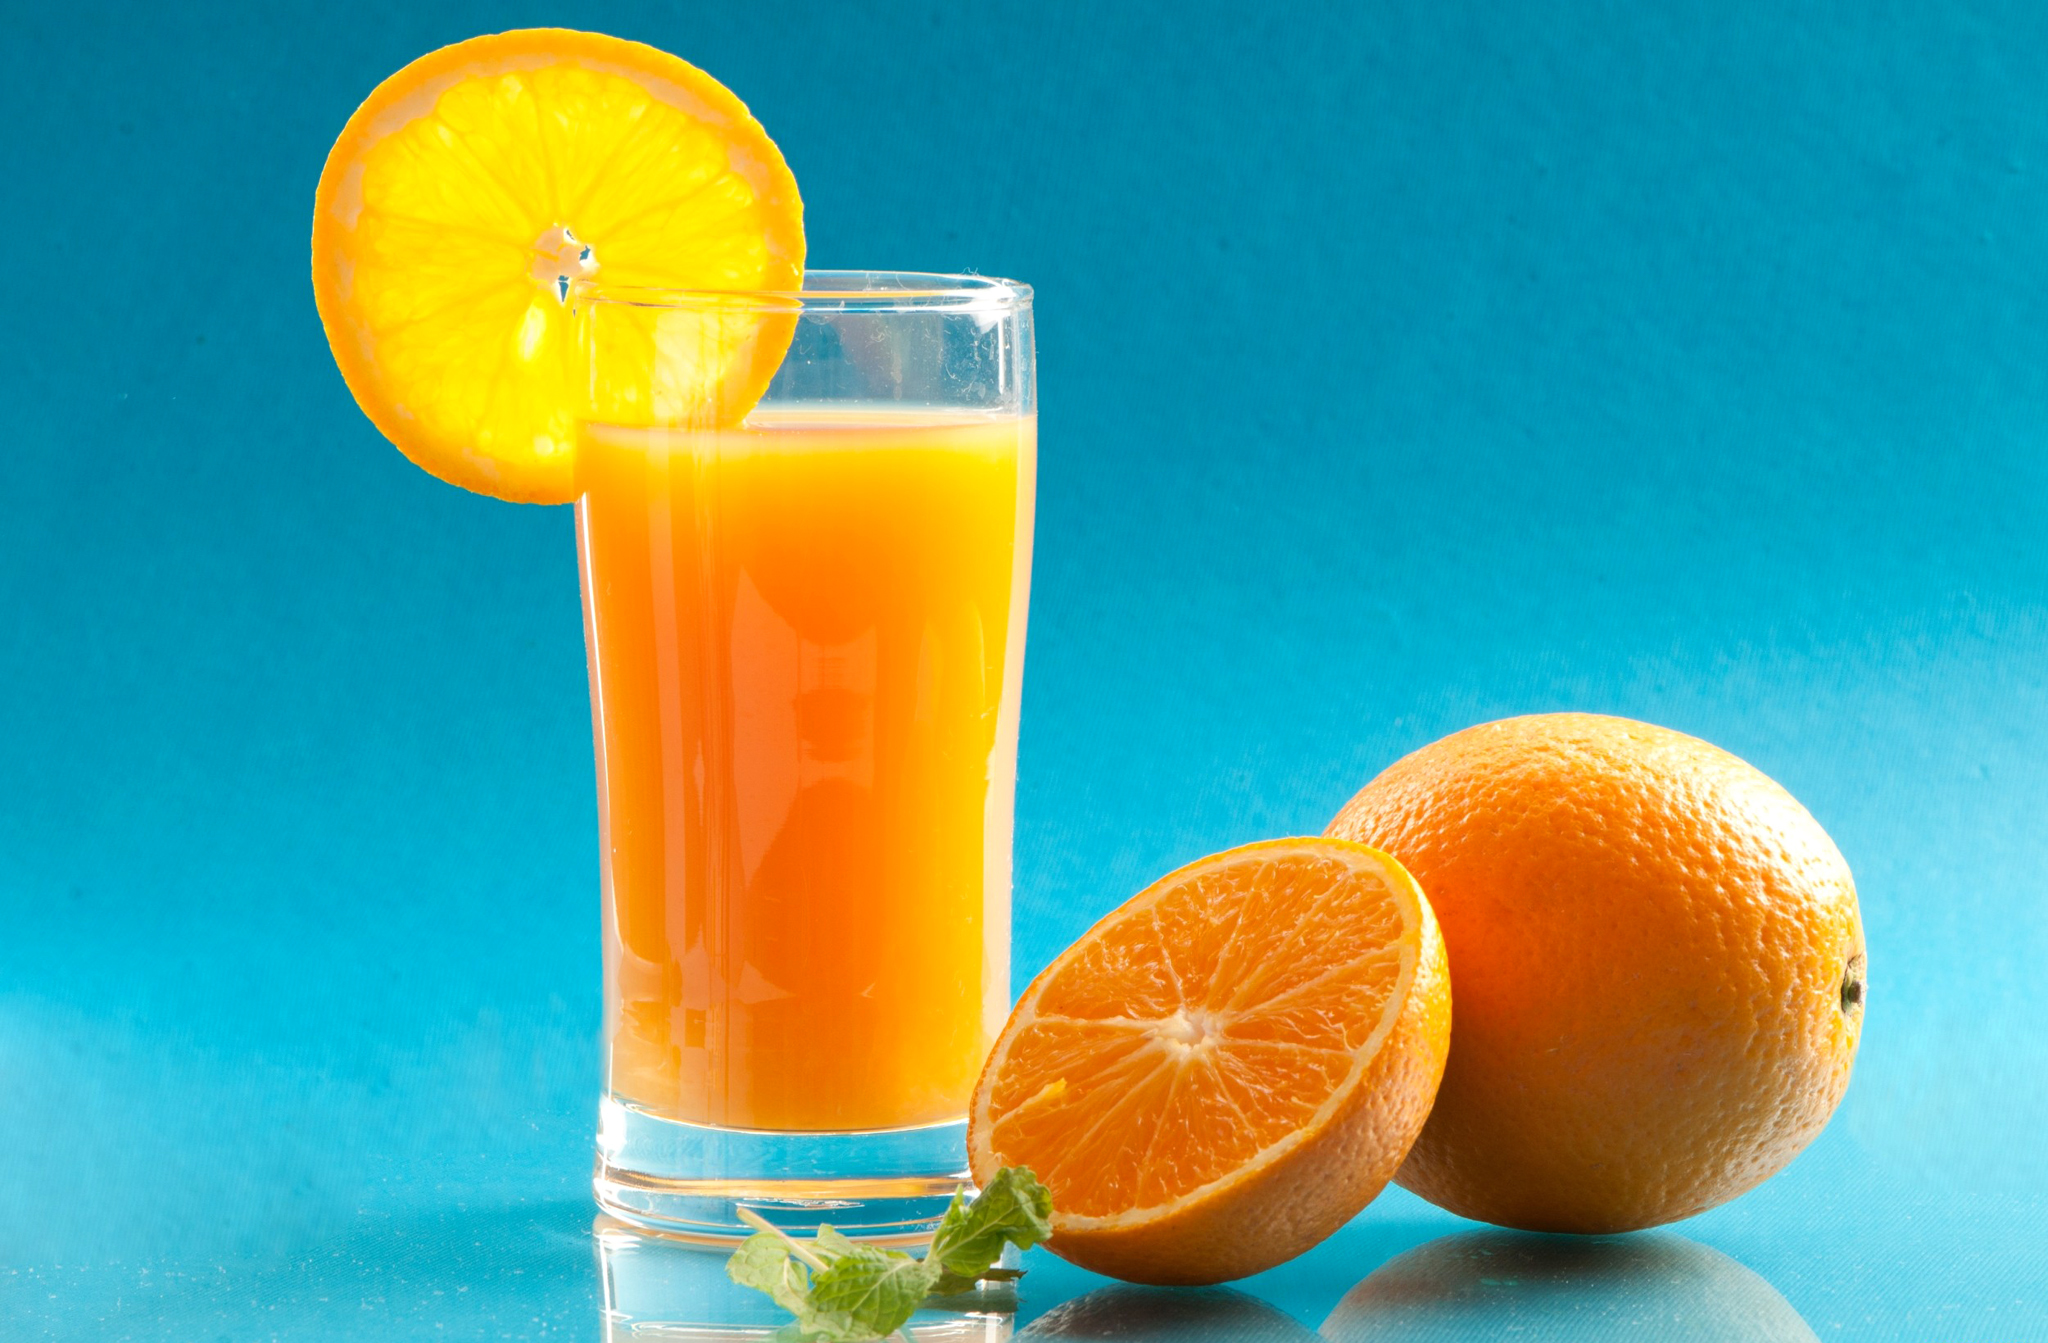 еда апельсин сок food orange juice  № 613518 без смс